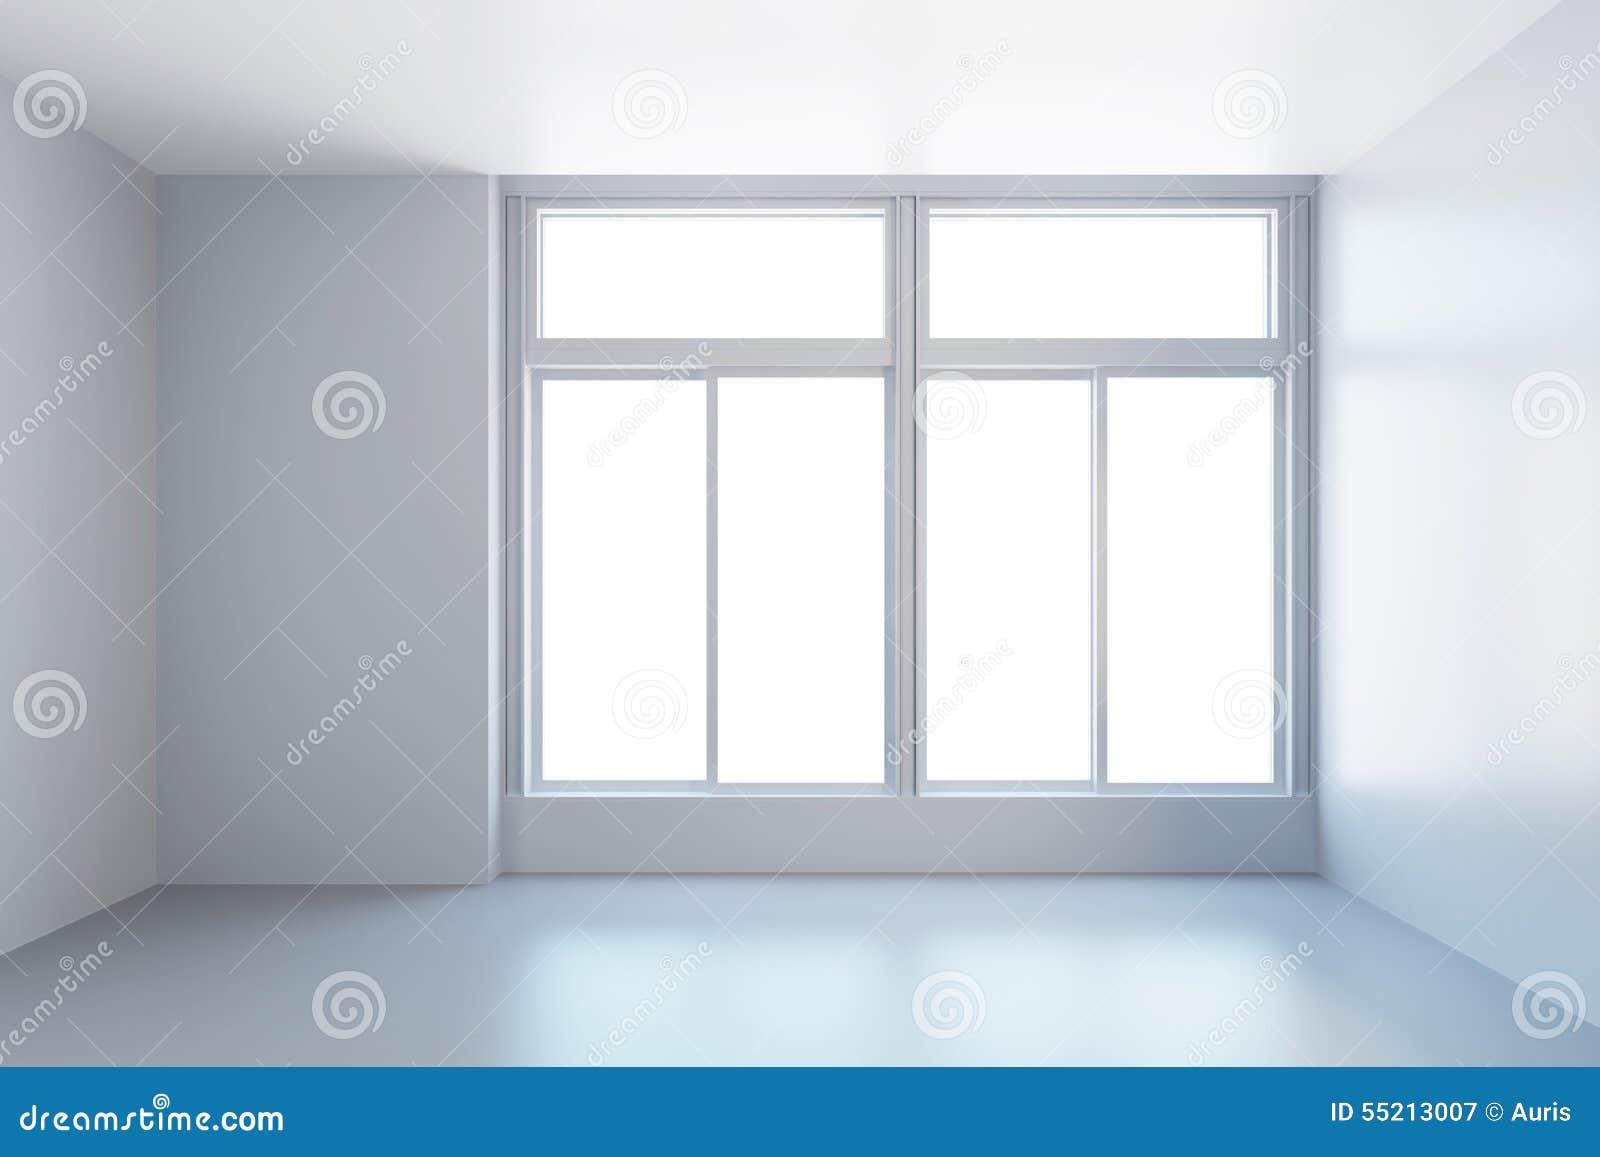 Pi ce vide blanche avec la fen tre photo stock image for Fenetre blanche